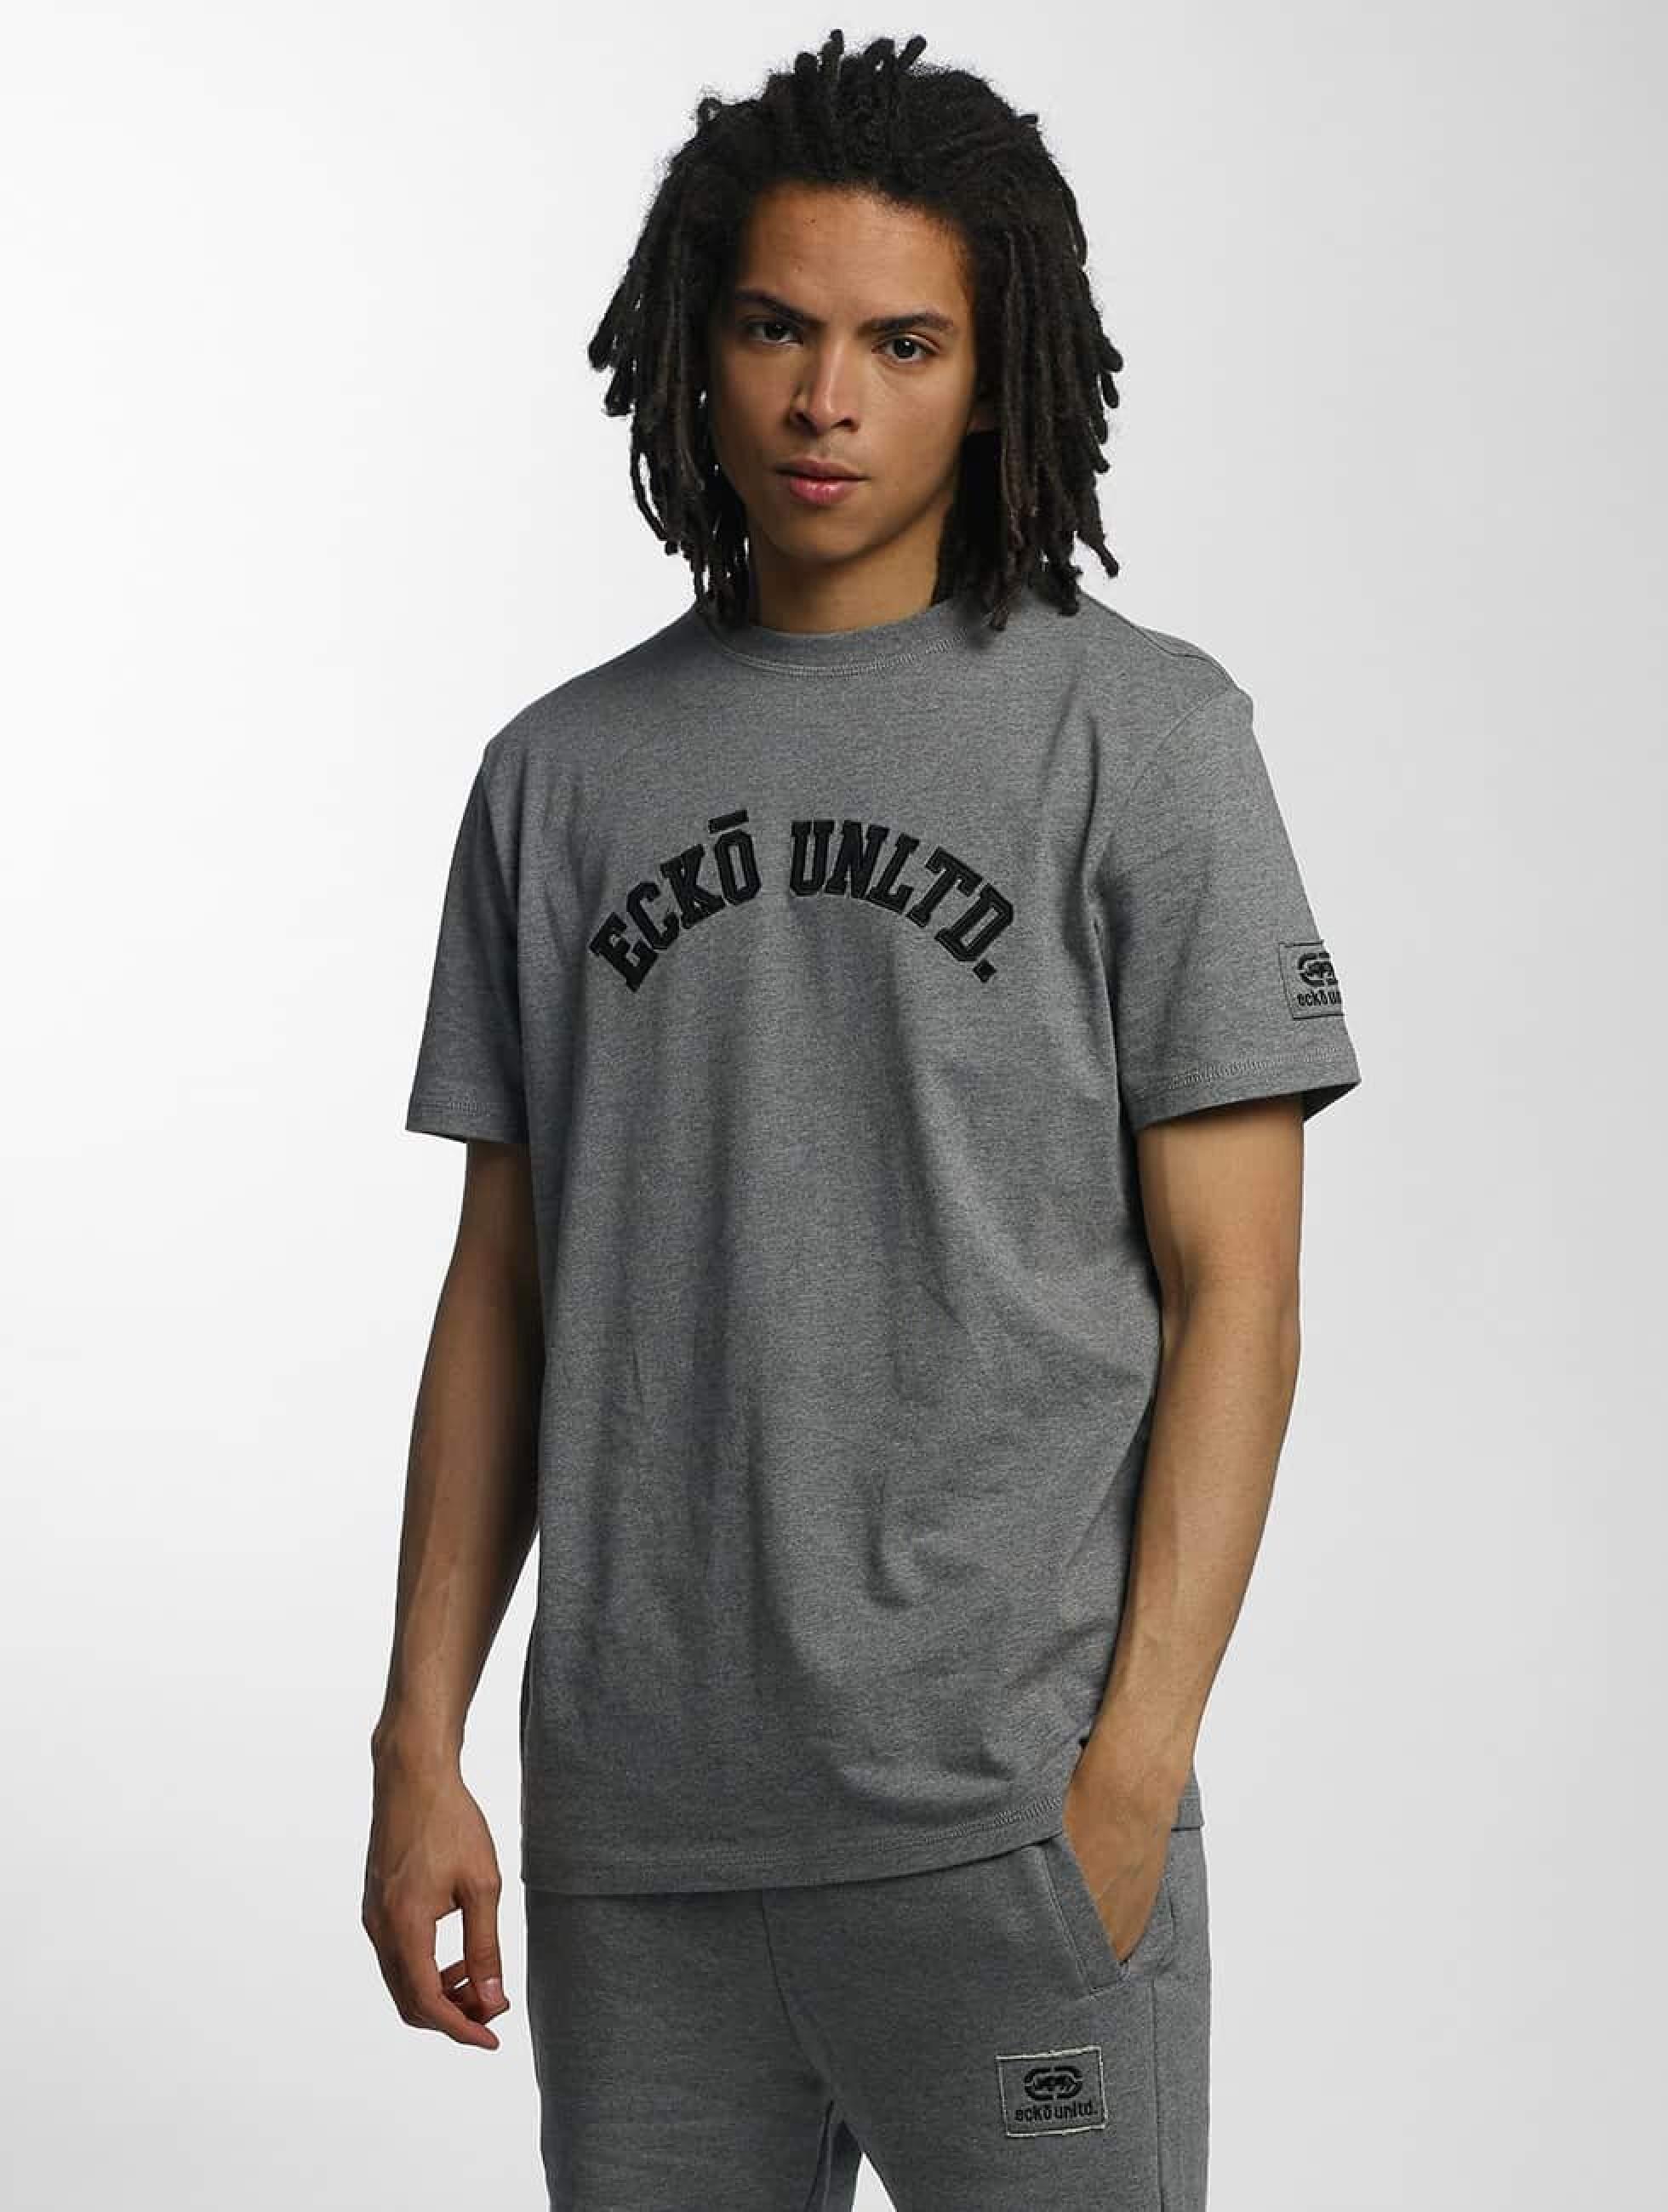 Ecko Unltd. / T-Shirt Melange in grey XL